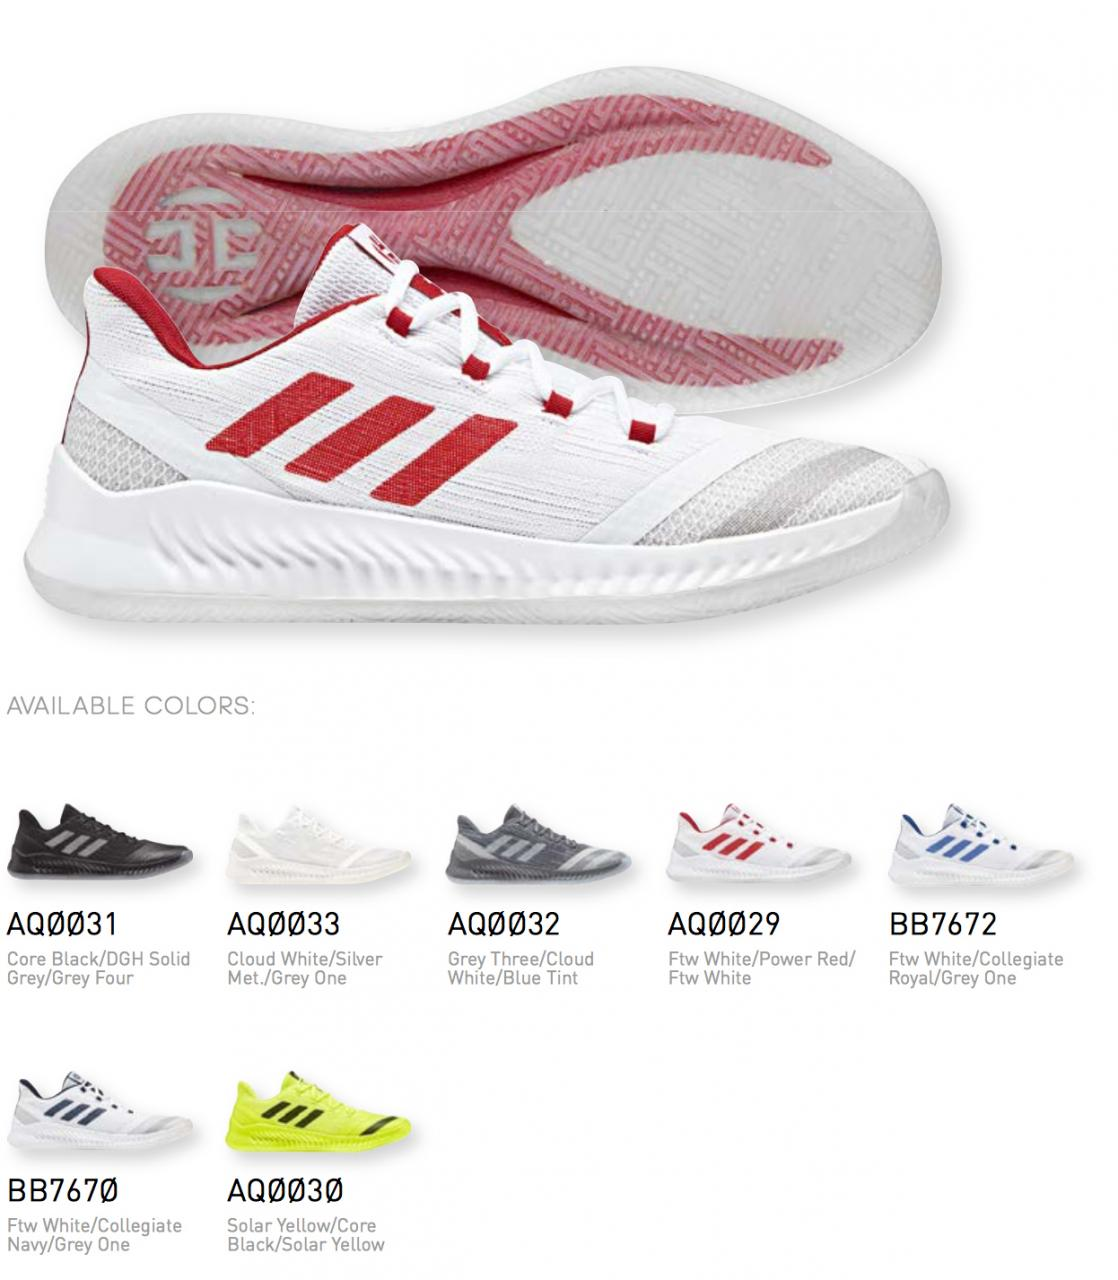 adidas,Harden B/E 2,Harden  火箭配色!哈登团队支线 adidas Harden B/E 2 首次曝光!